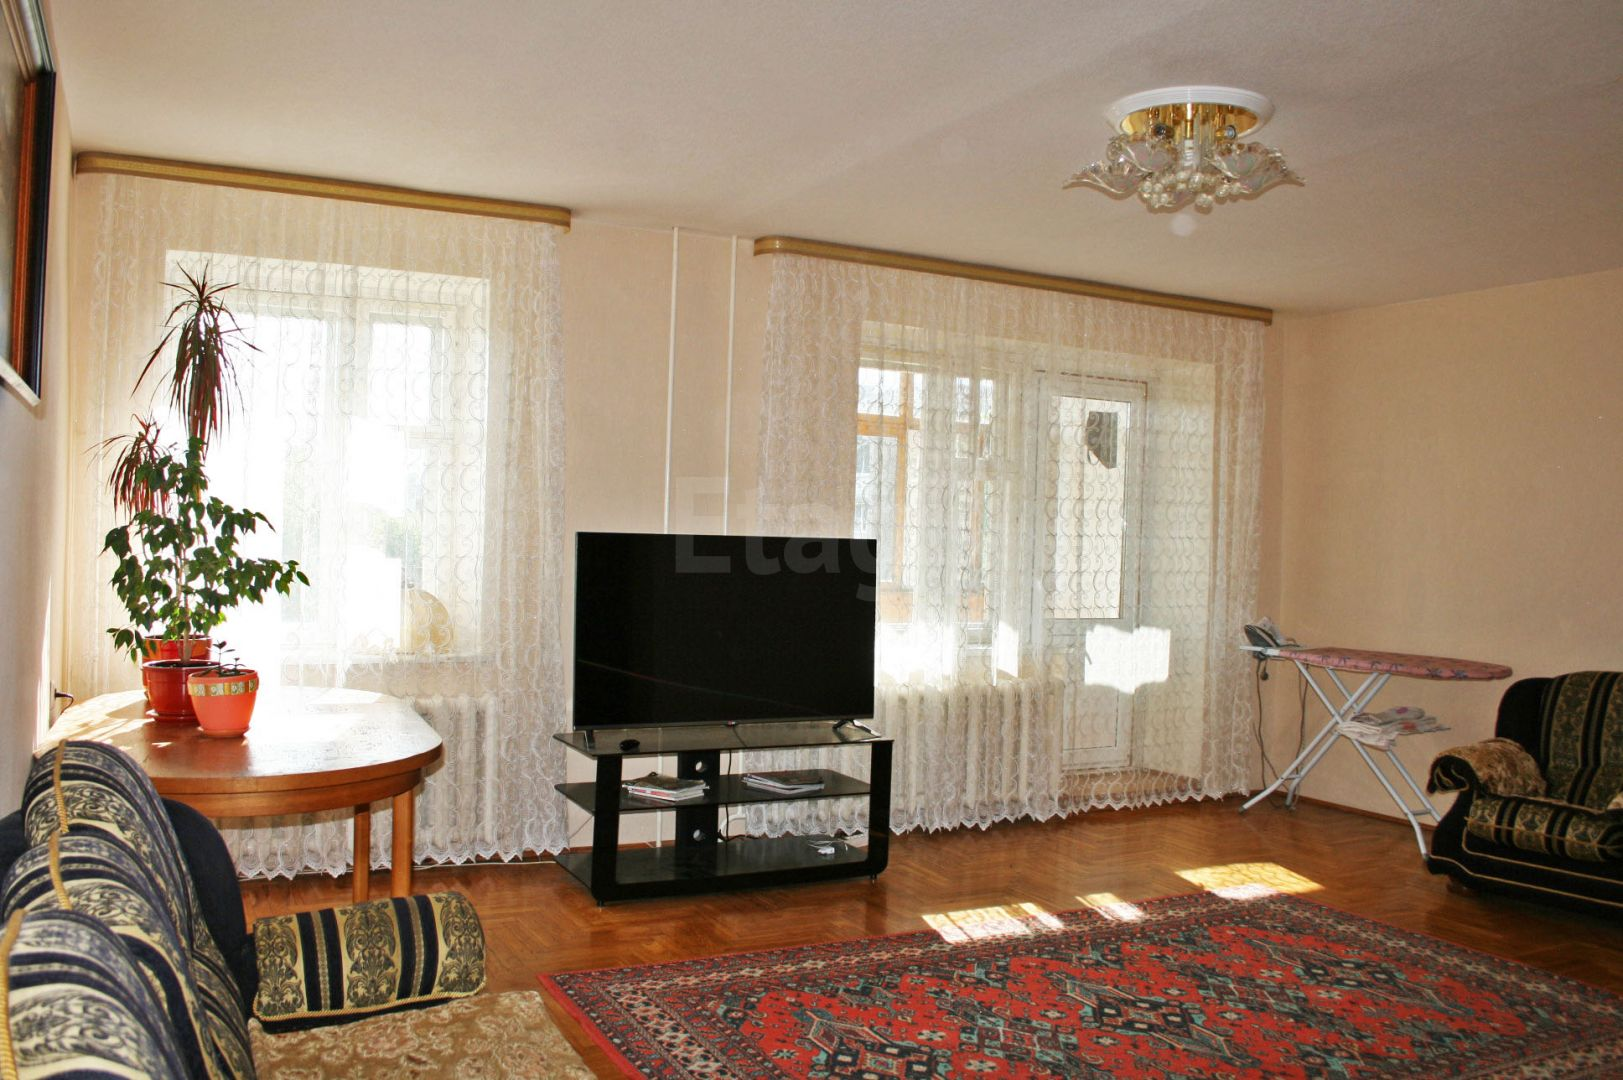 Муром, Артема, 29, 3-к. квартира на продажу